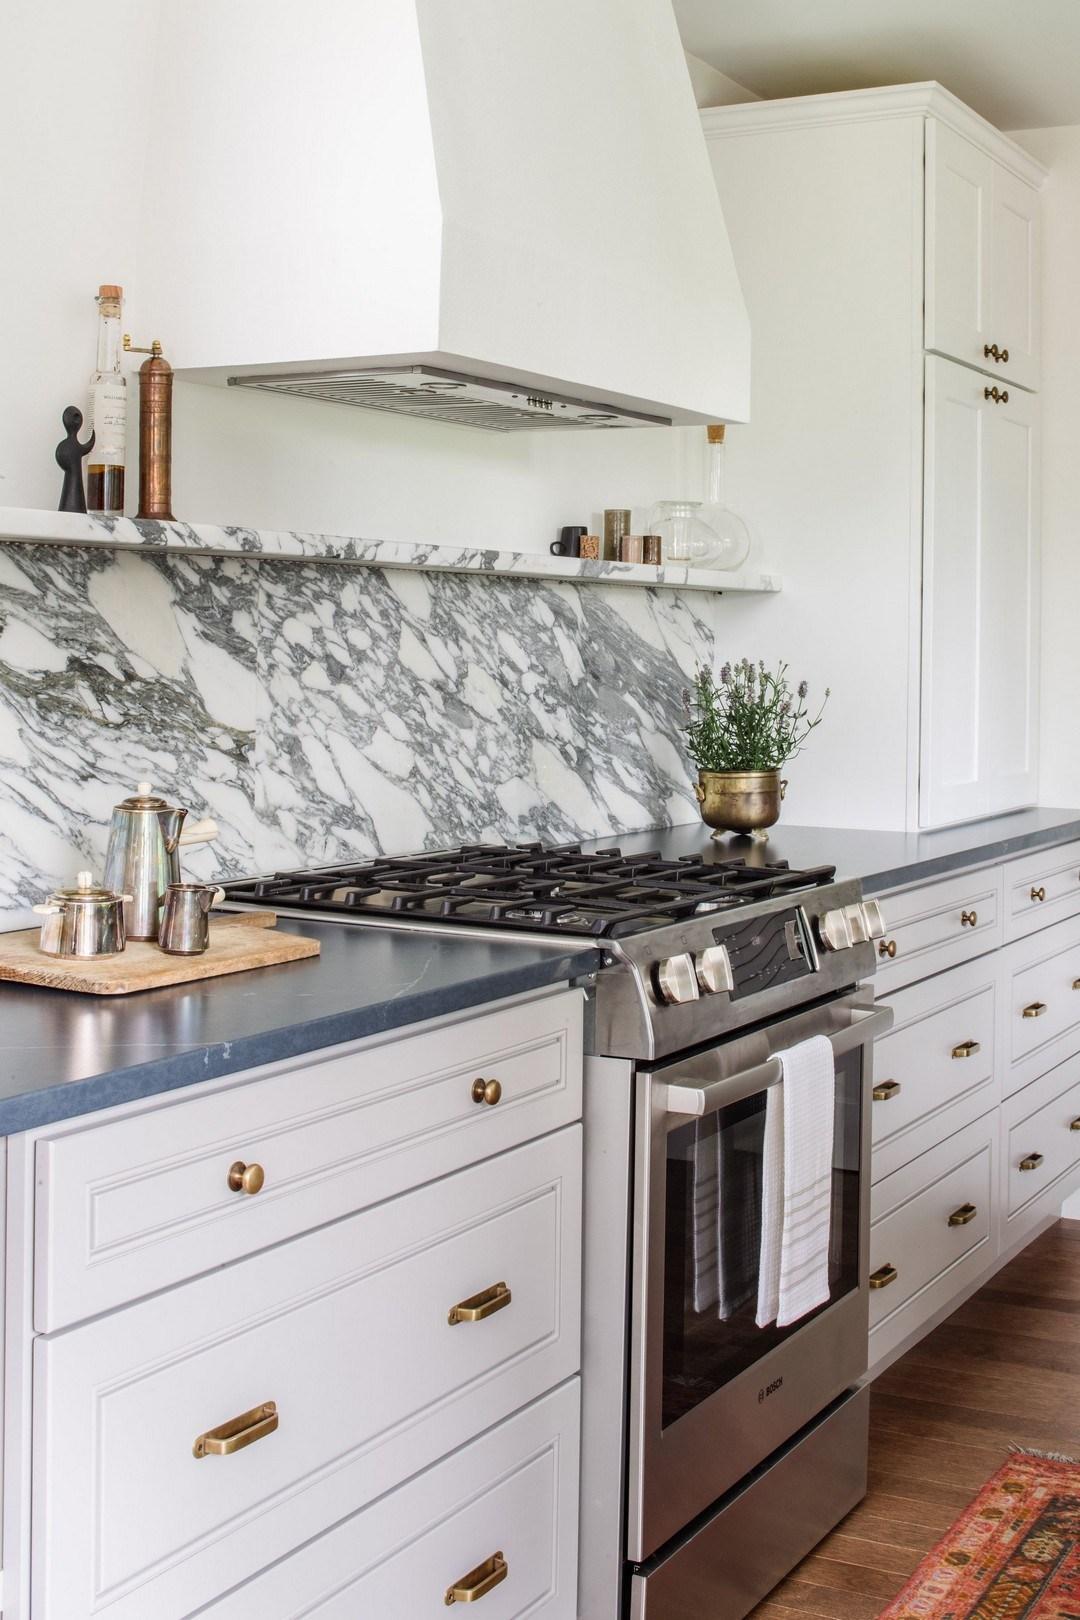 Abstrakt backsplash i marmorkök